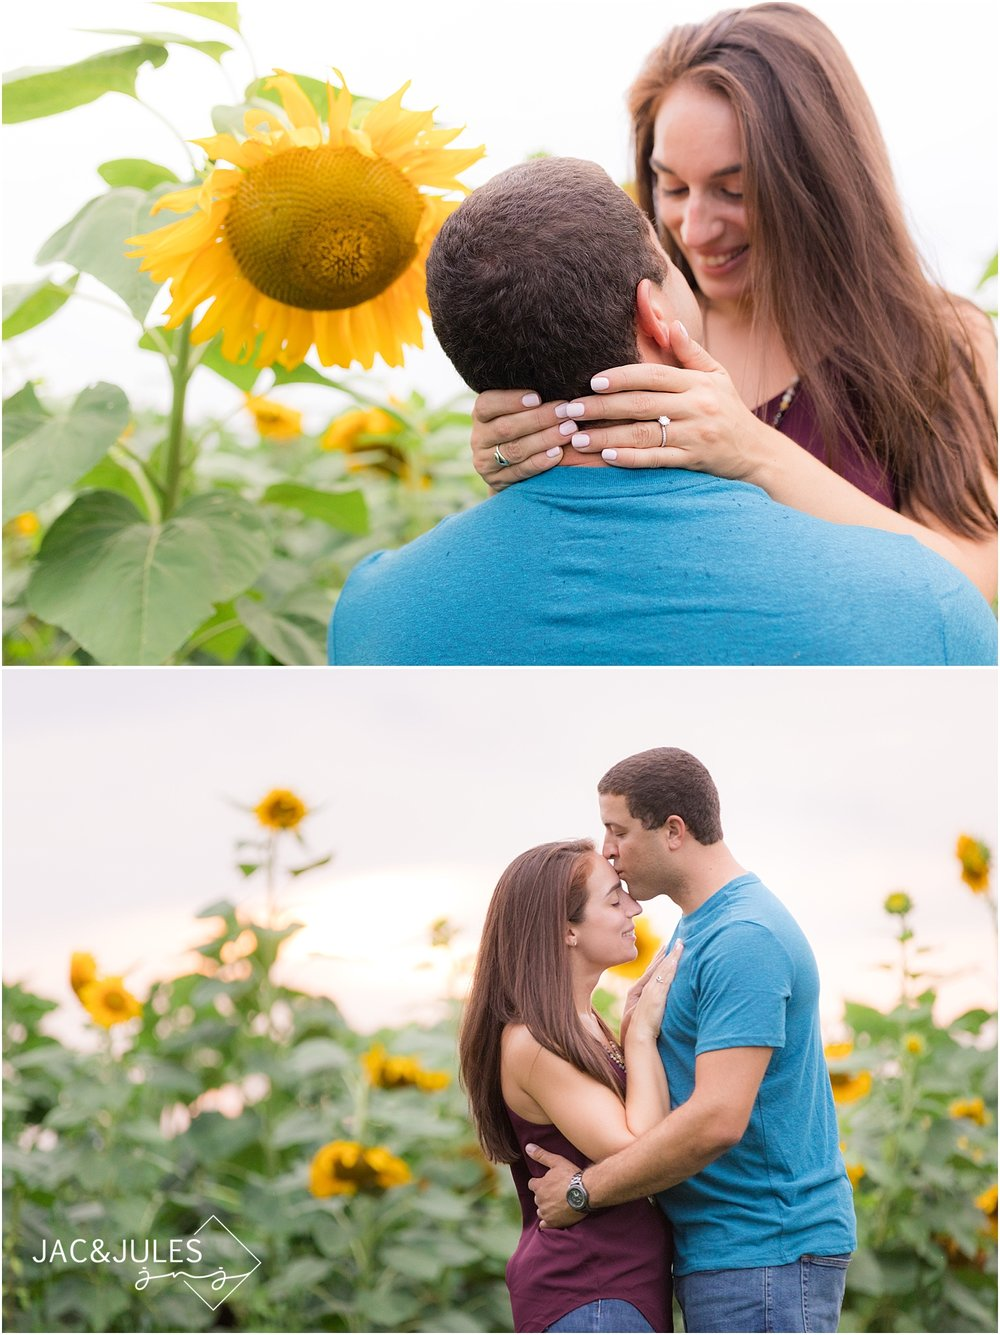 sunset engagement photos in a sunflower field